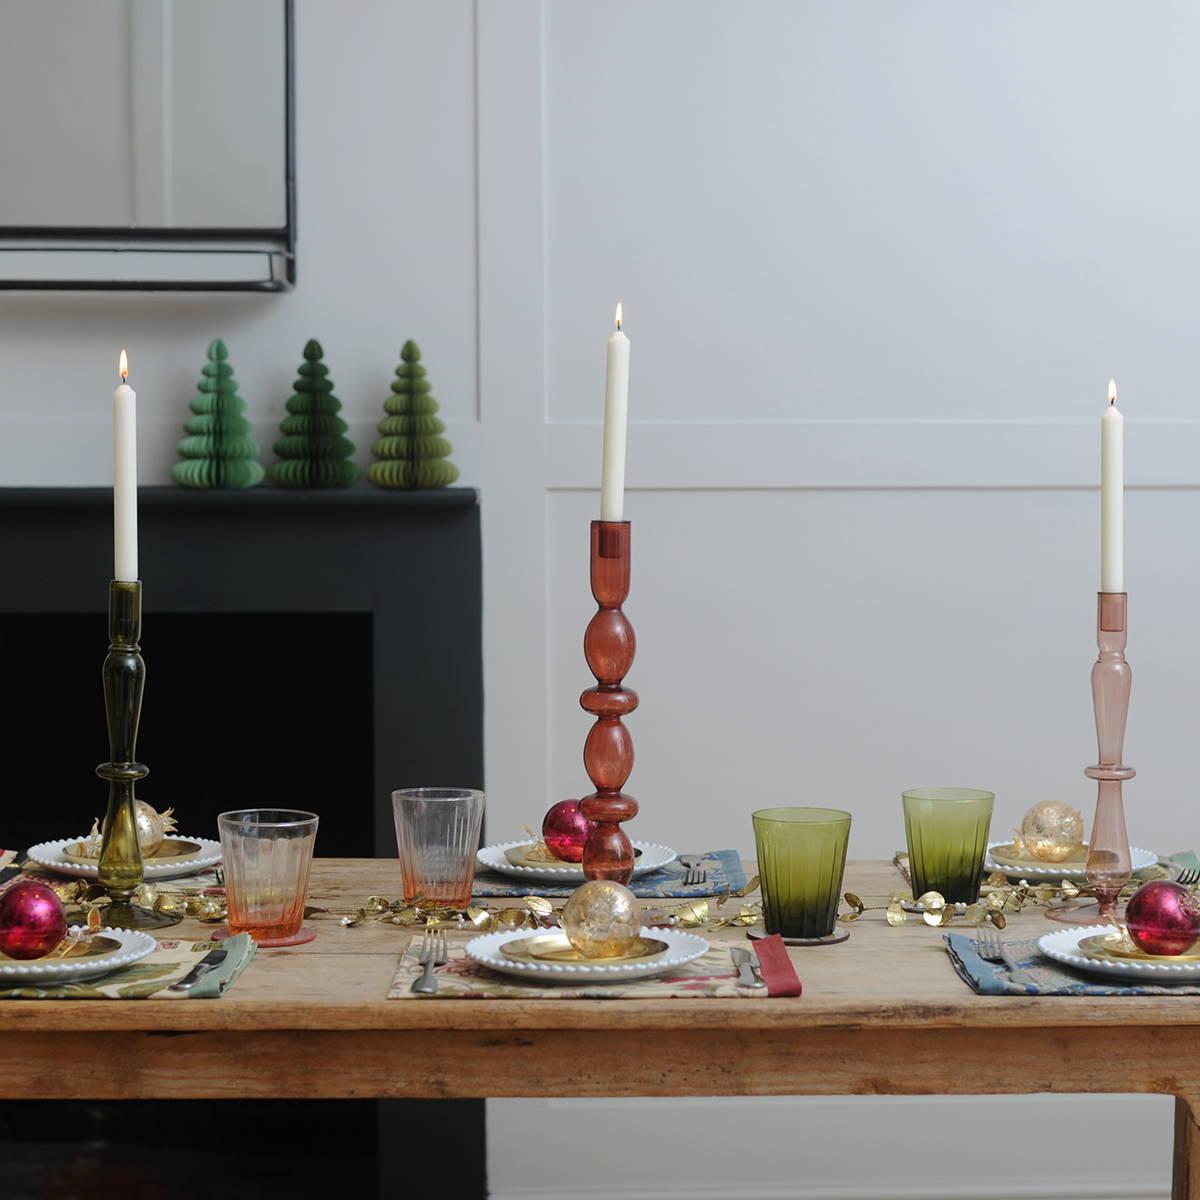 The Danish Table